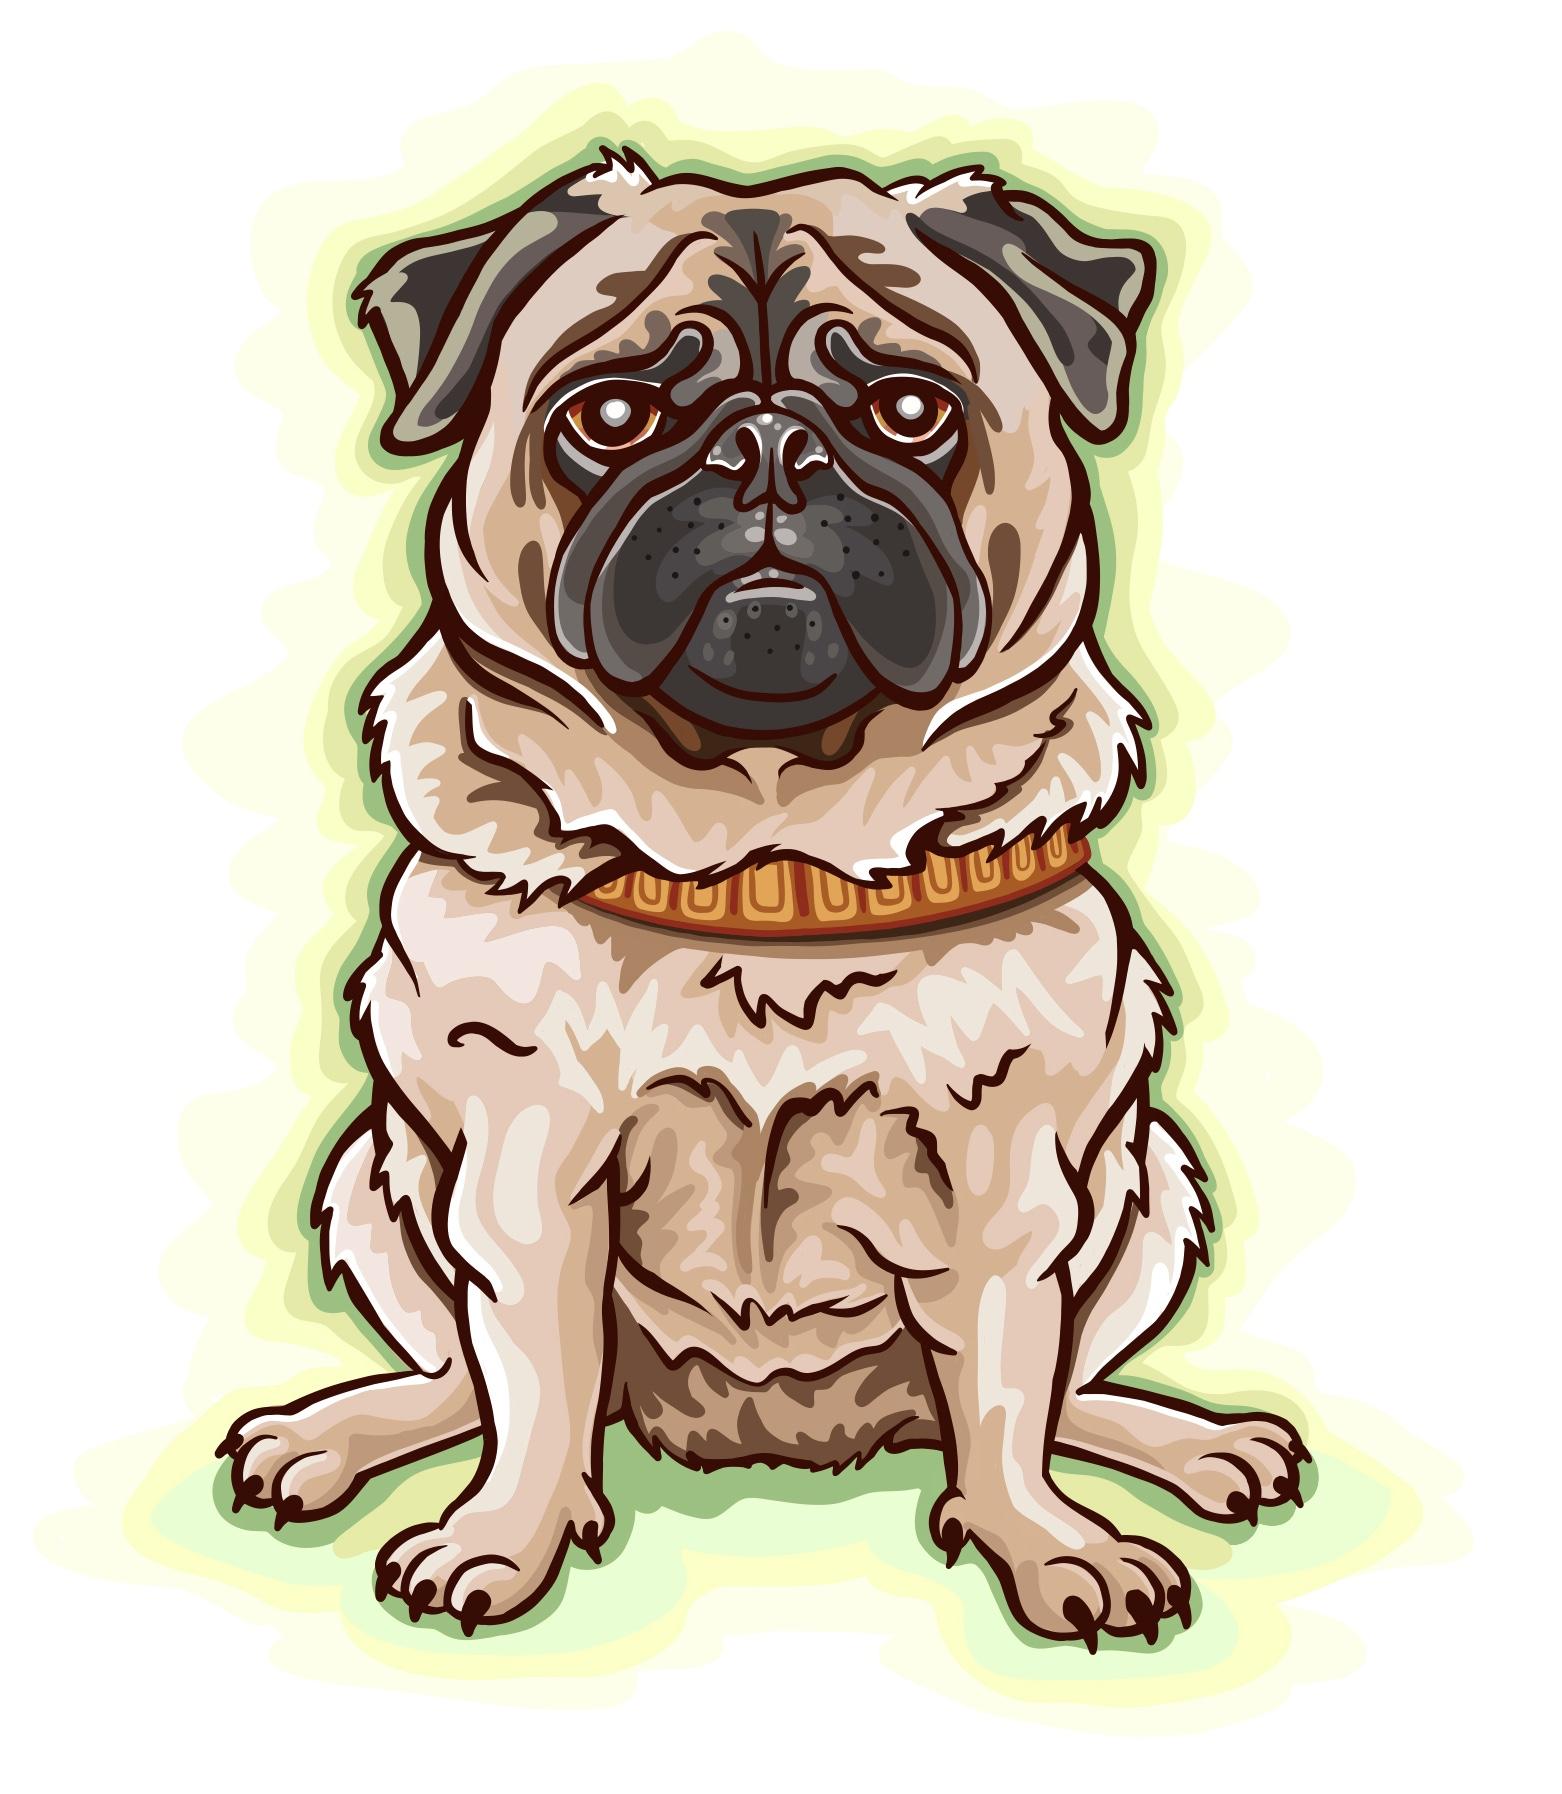 Pug Dog Cartoon Illustration Logo Graphic by Jessica Laine Morris